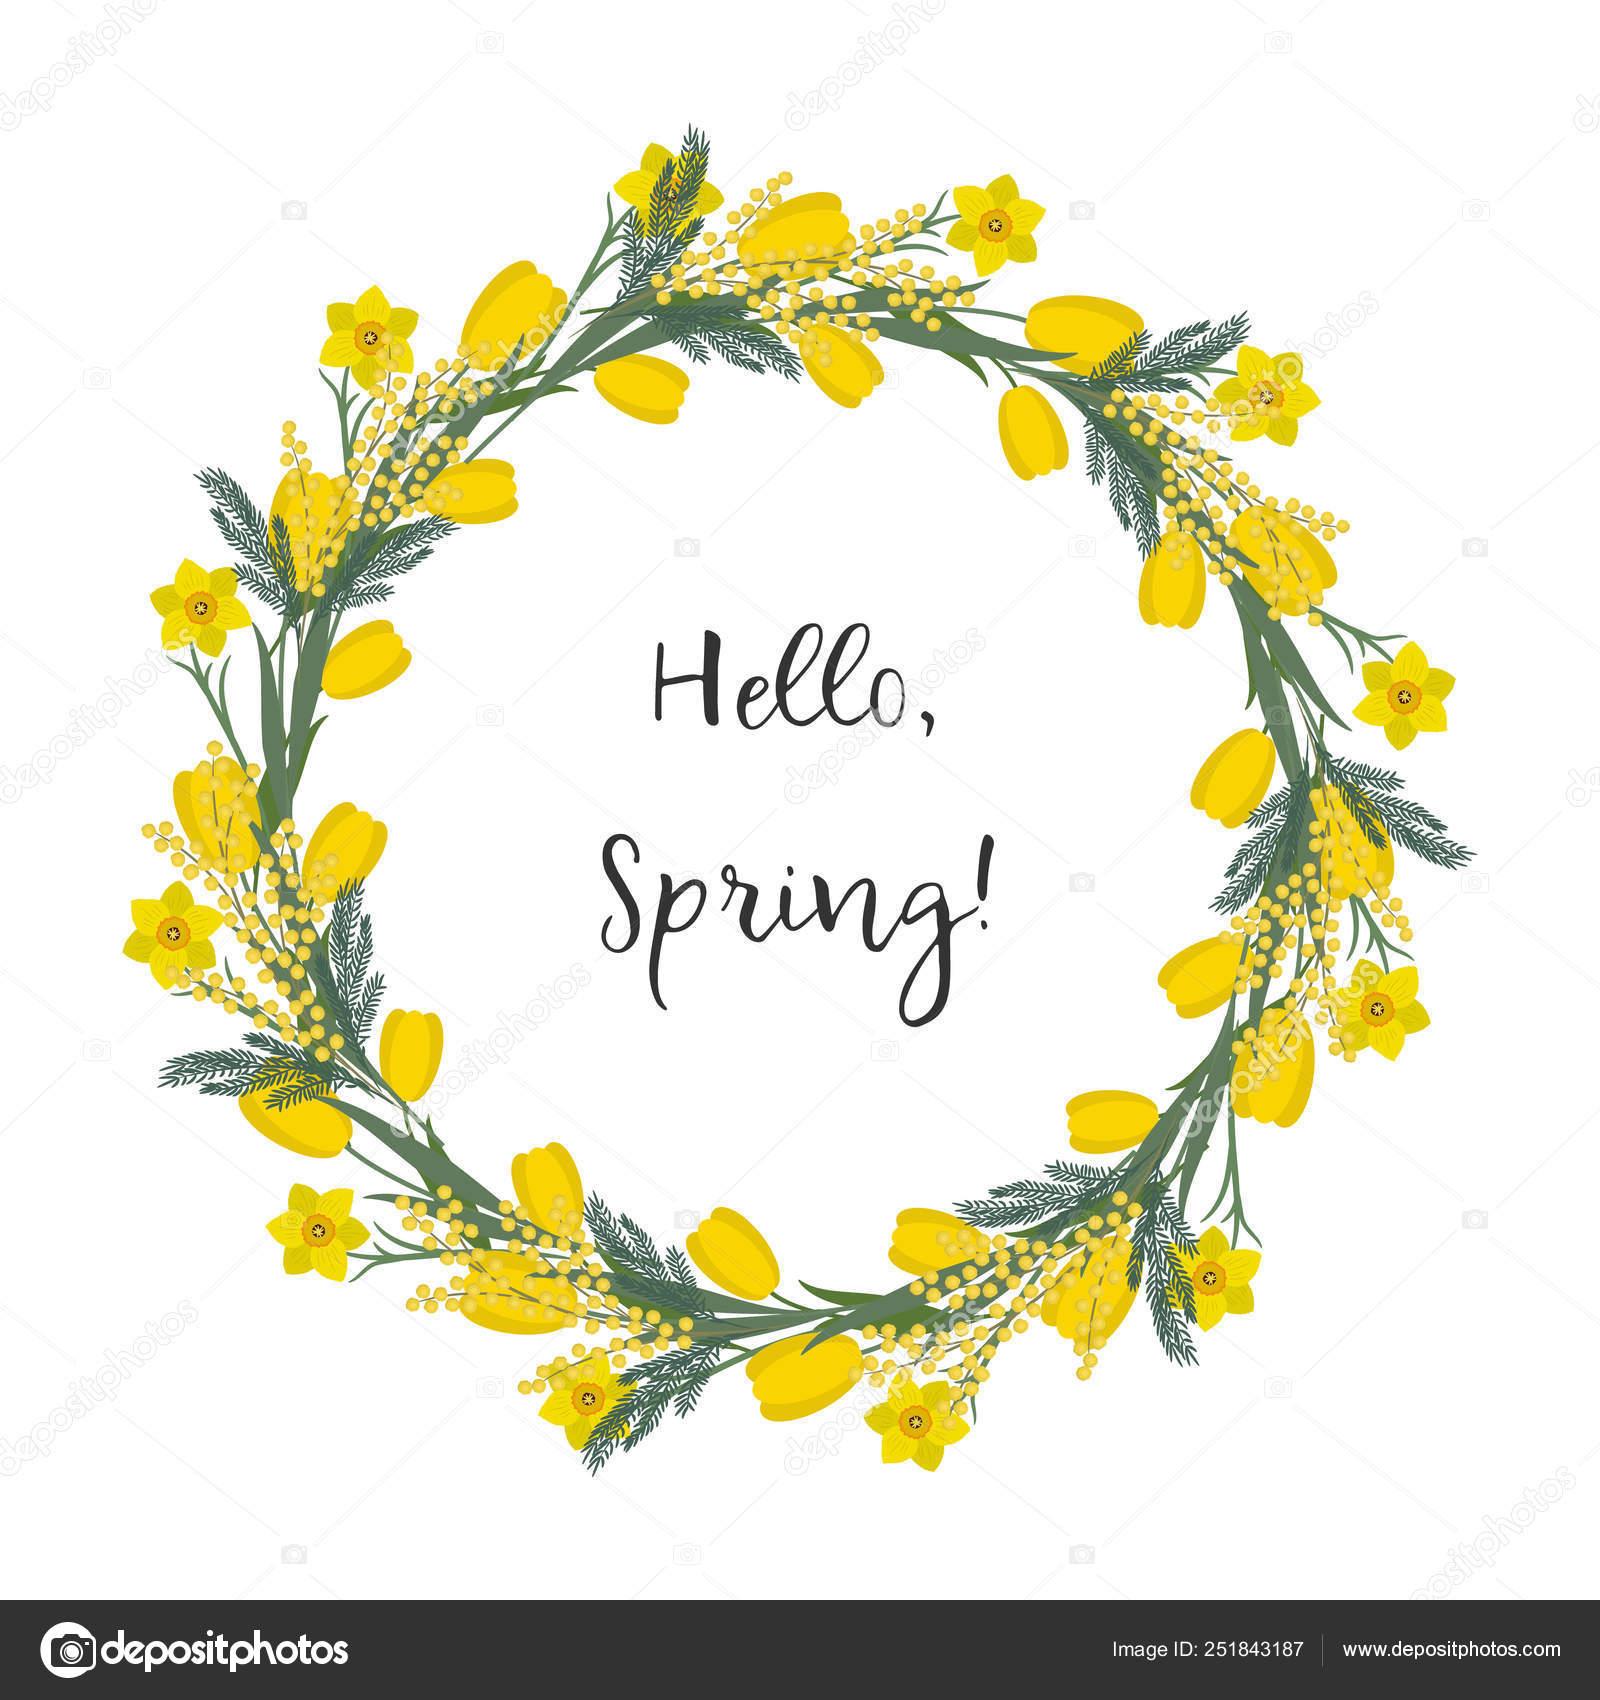 Fiori Primaverili Gialli.Floral Frame Rotonda Fiori Primaverili Fiori Gialli Tulipani